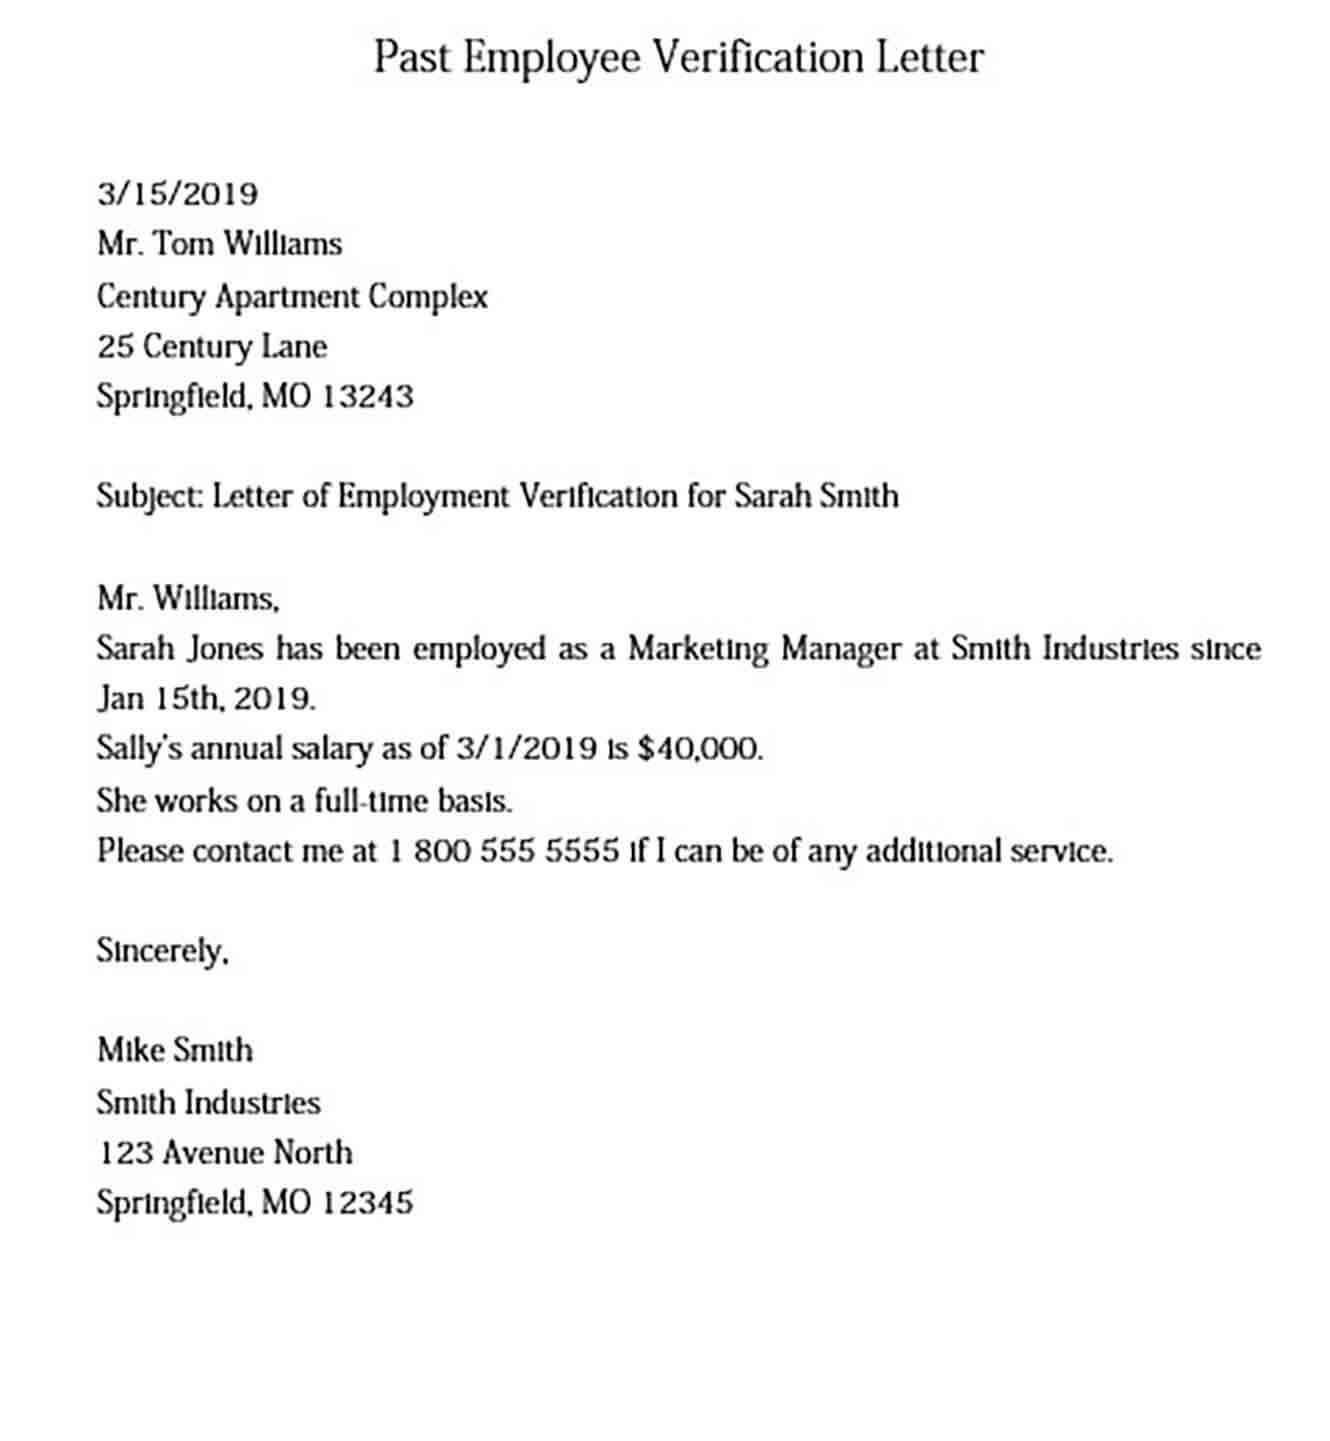 Past Employee Verification Letter Sample